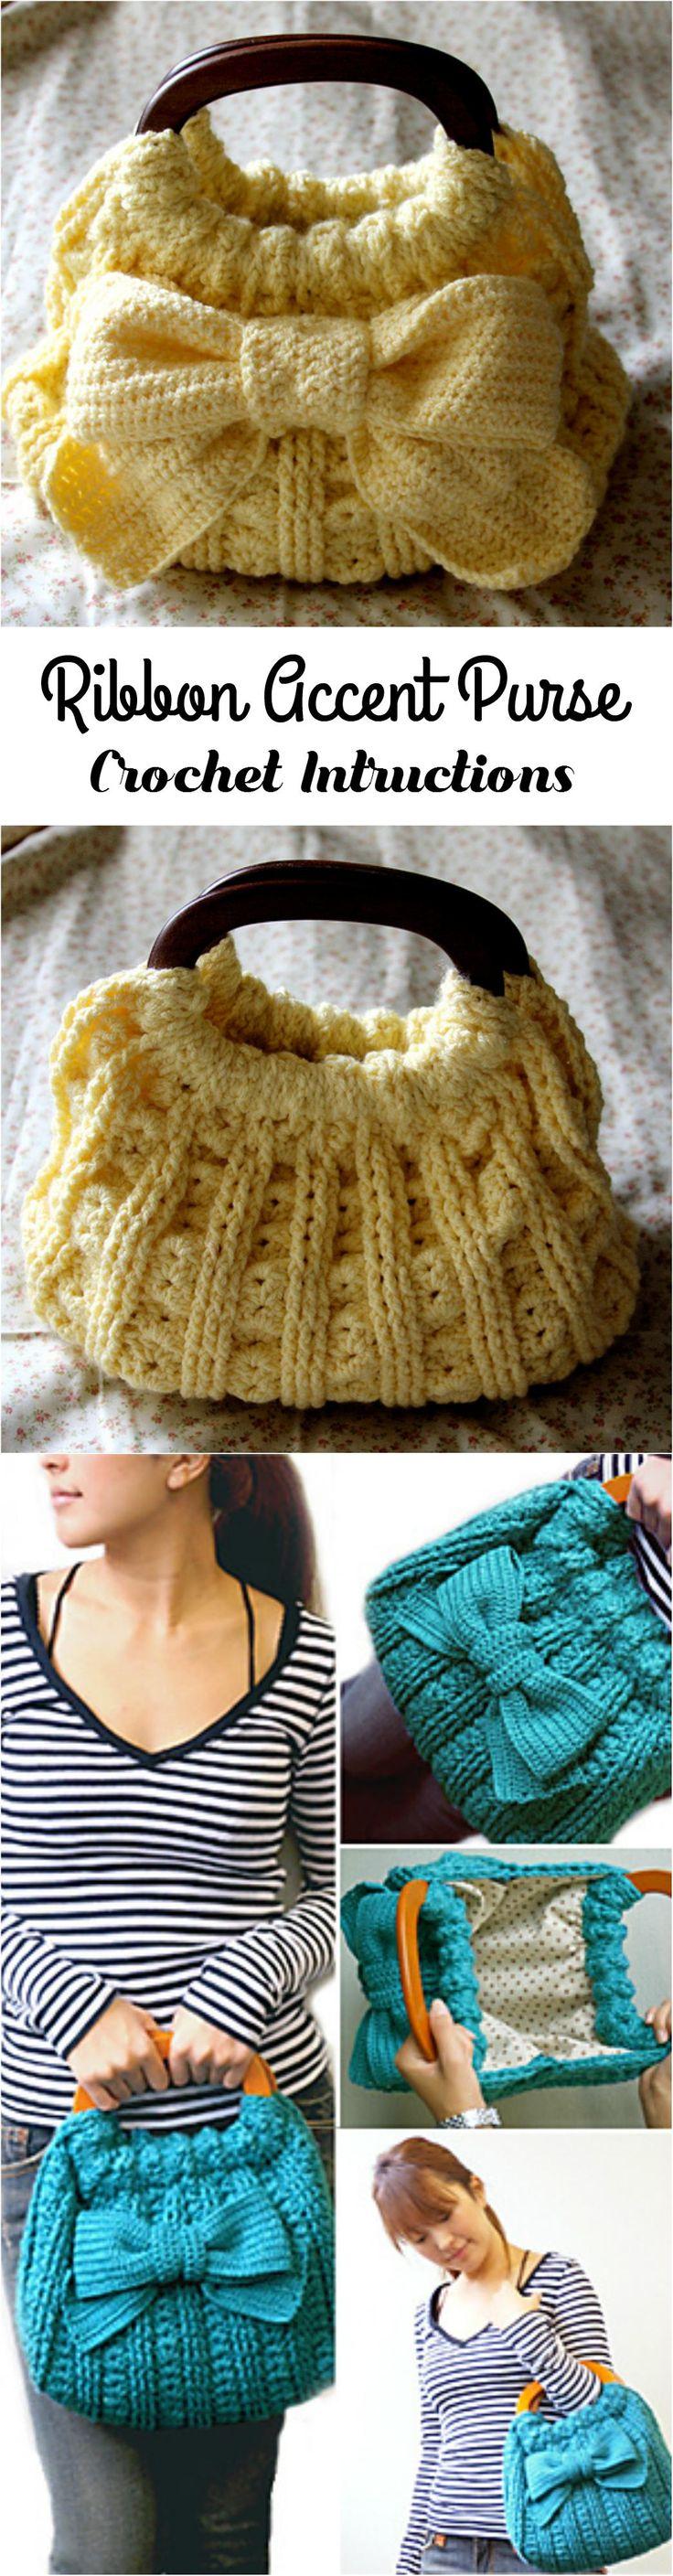 Crochet Ribbon Accent Purse